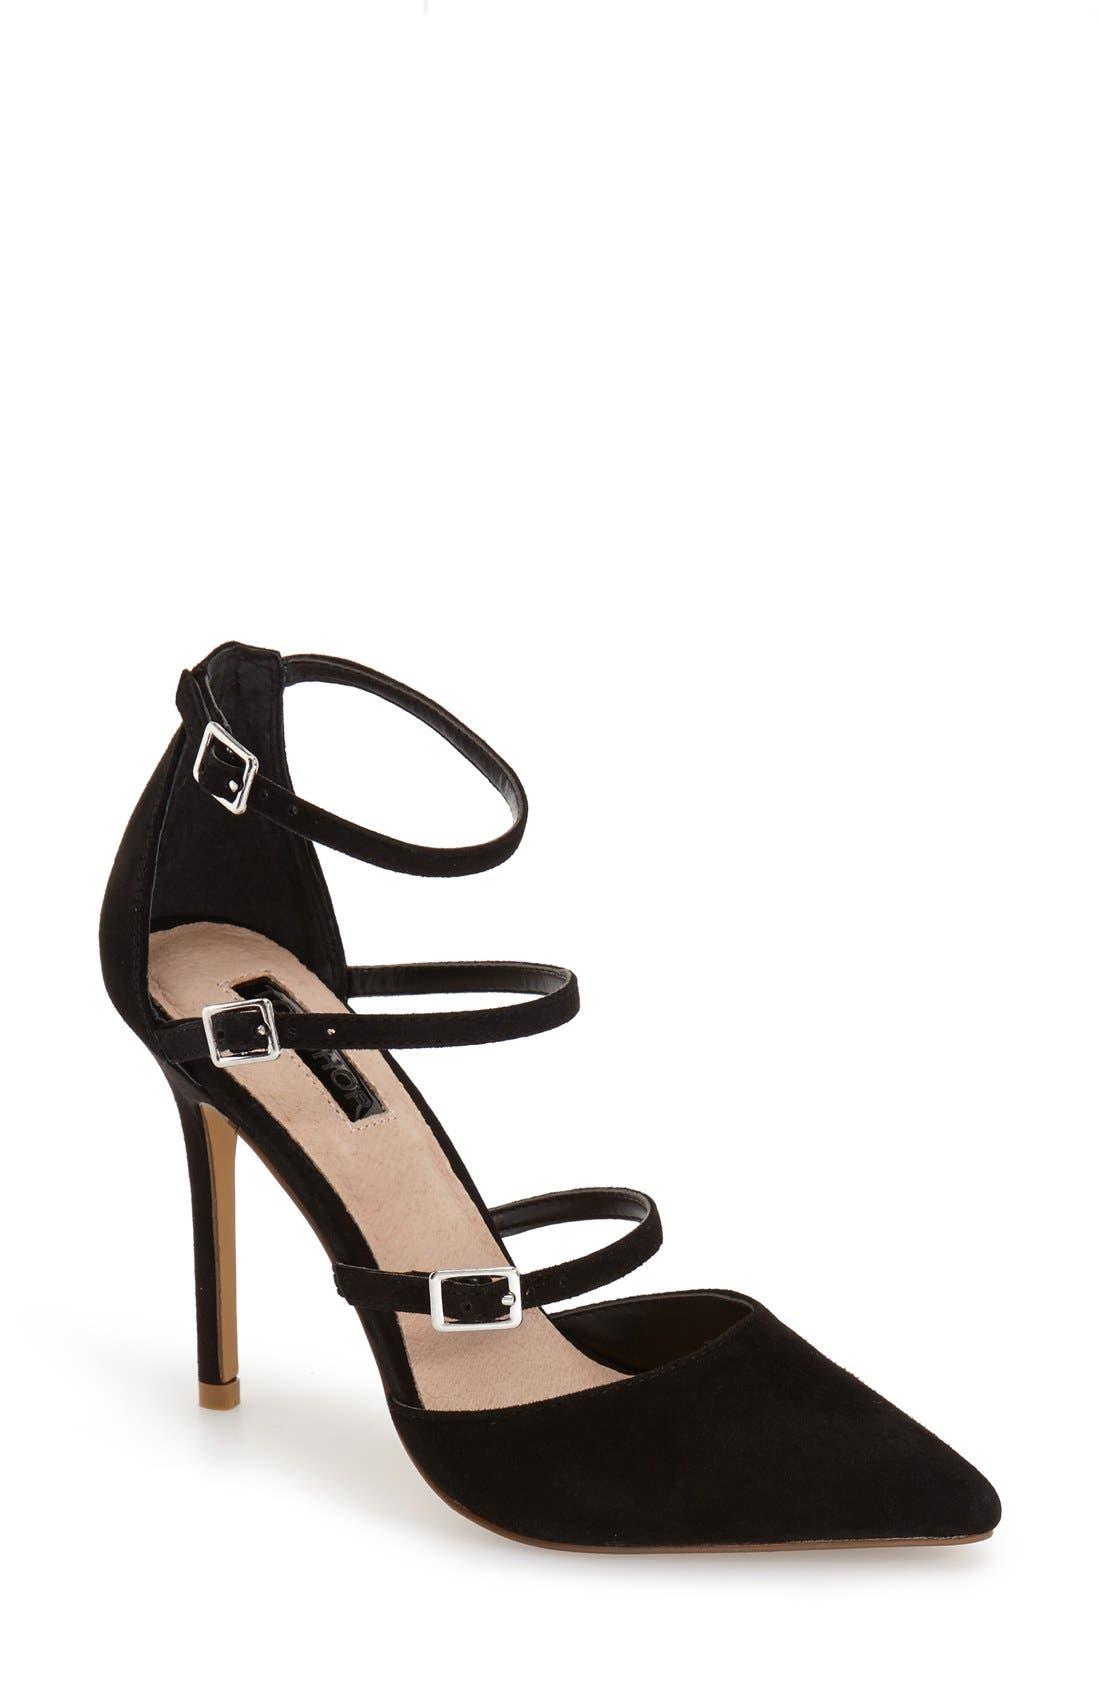 Alternate Image 1 Selected - Topshop 'Giselle' Buckle Sandal (Women)